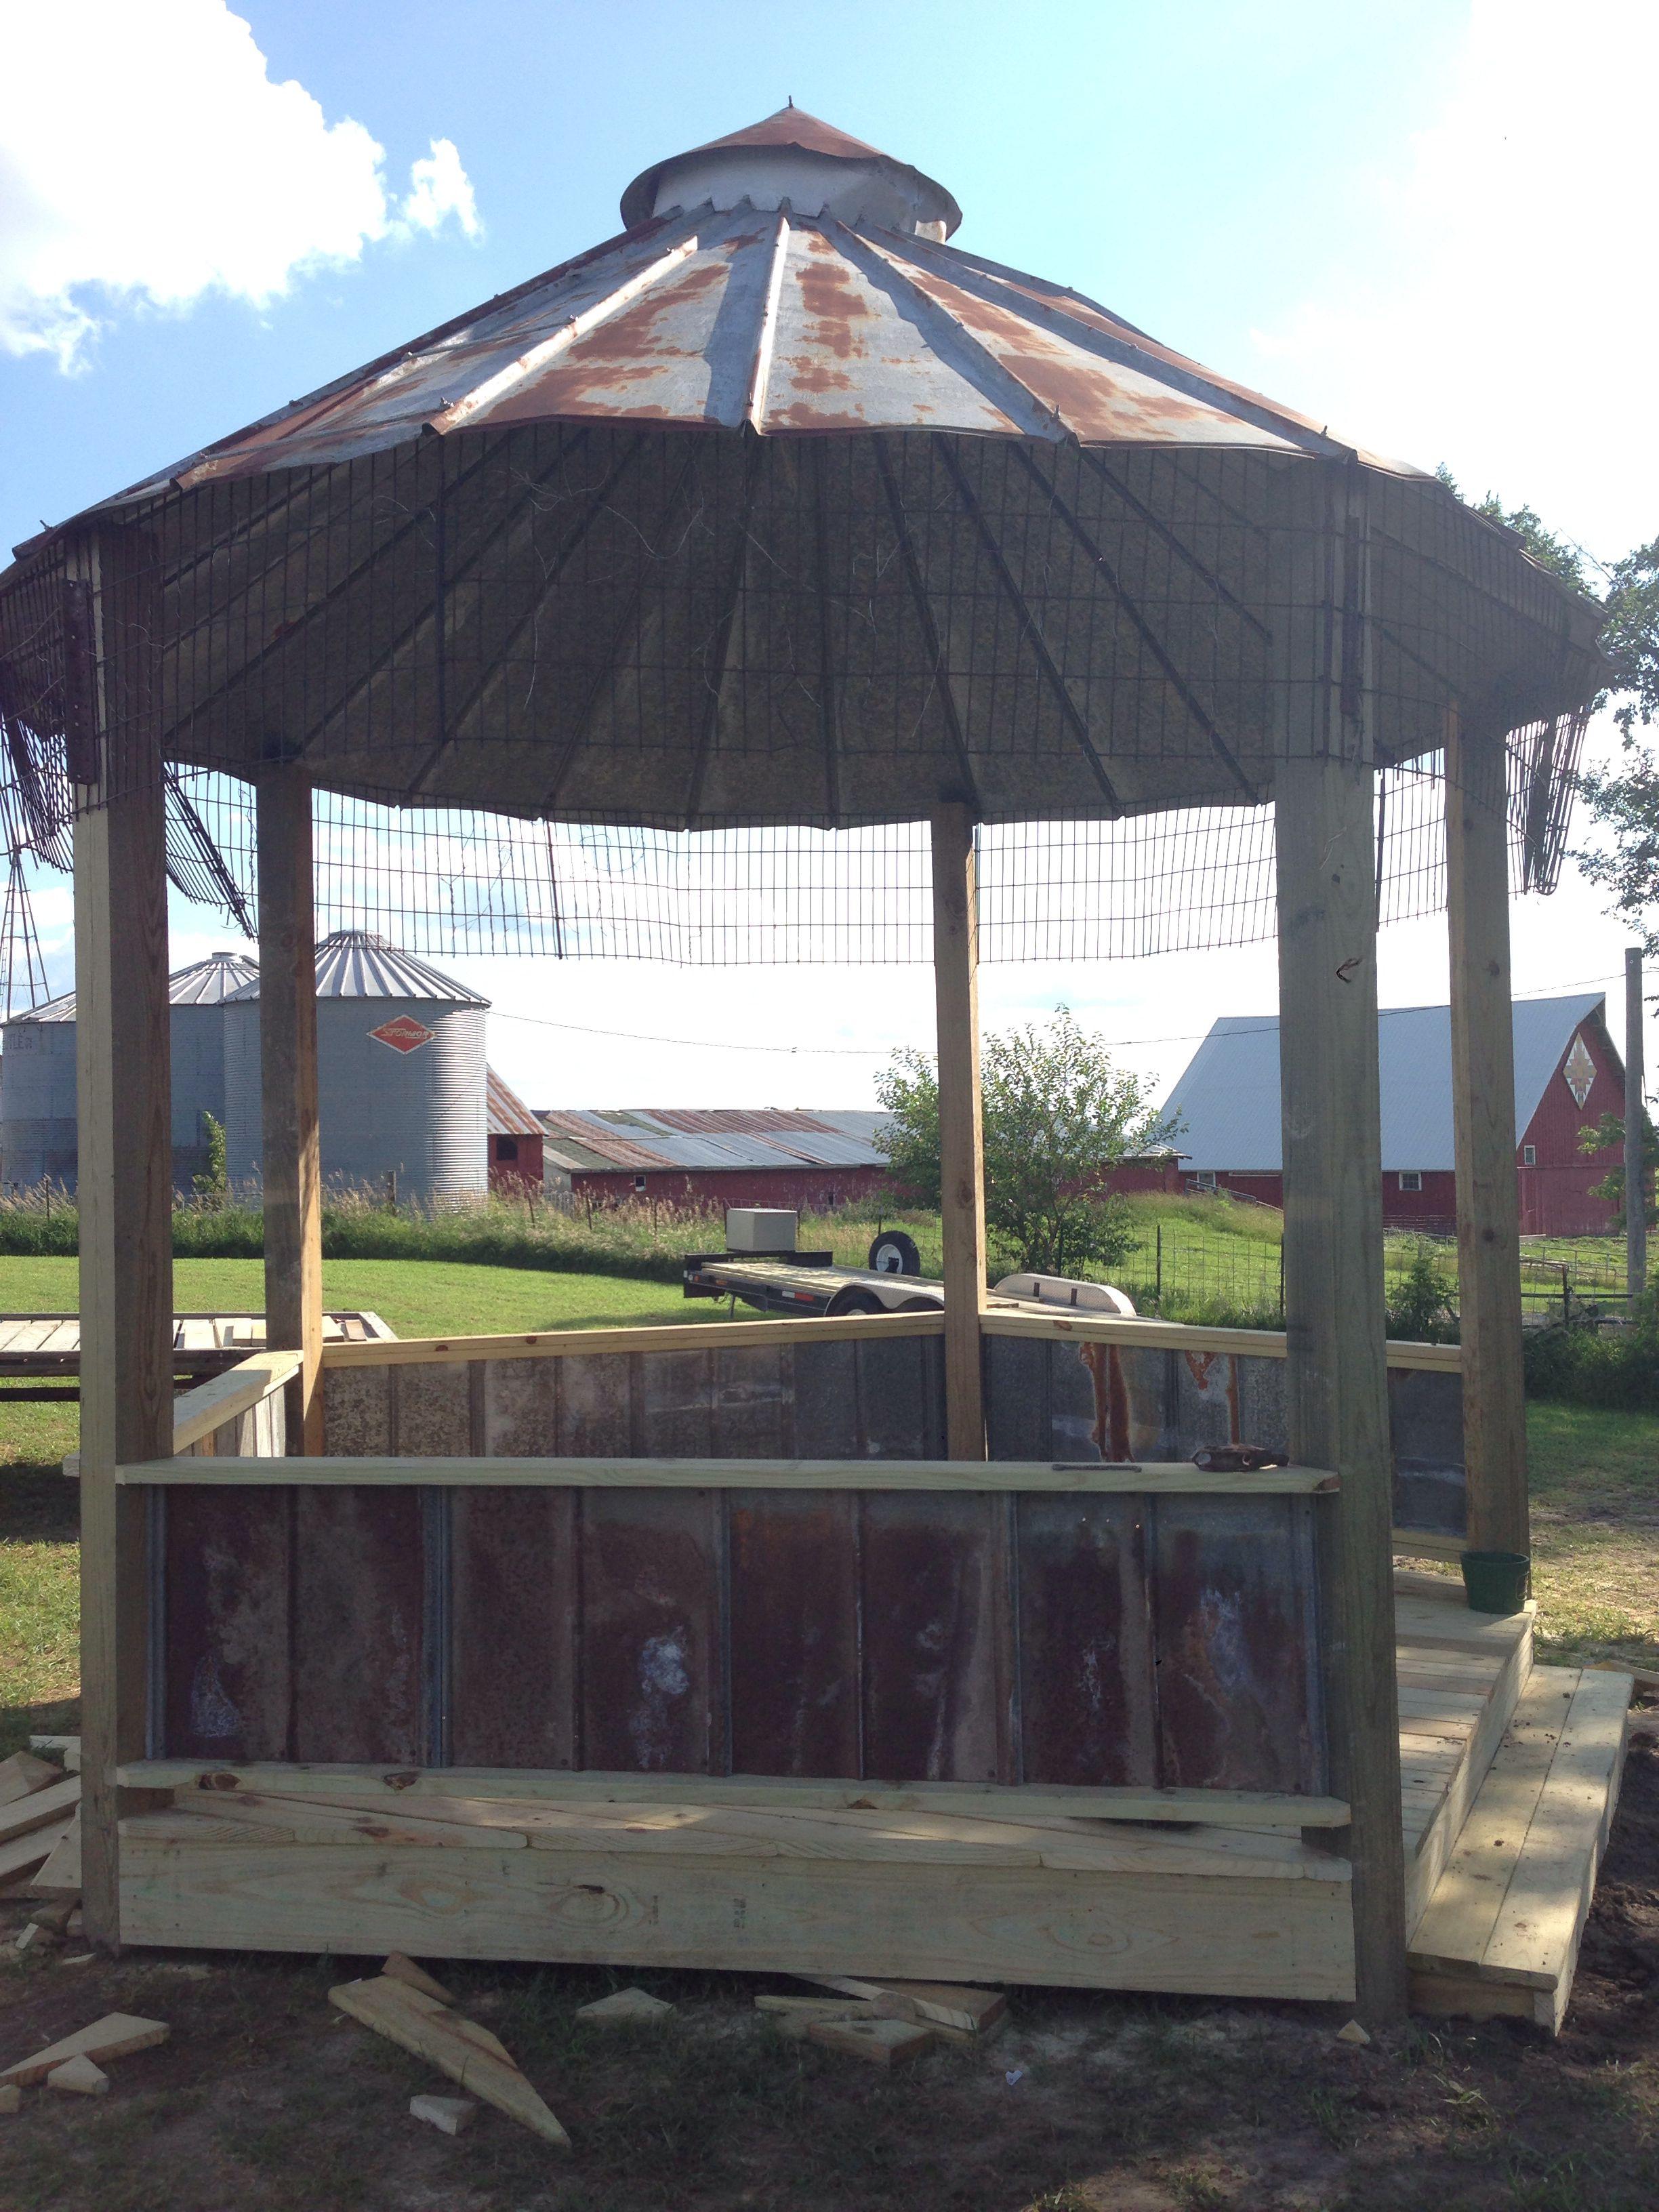 Corn crib gazebo with rustic tin roof chair rail gazebo for Rustic gazebo plans